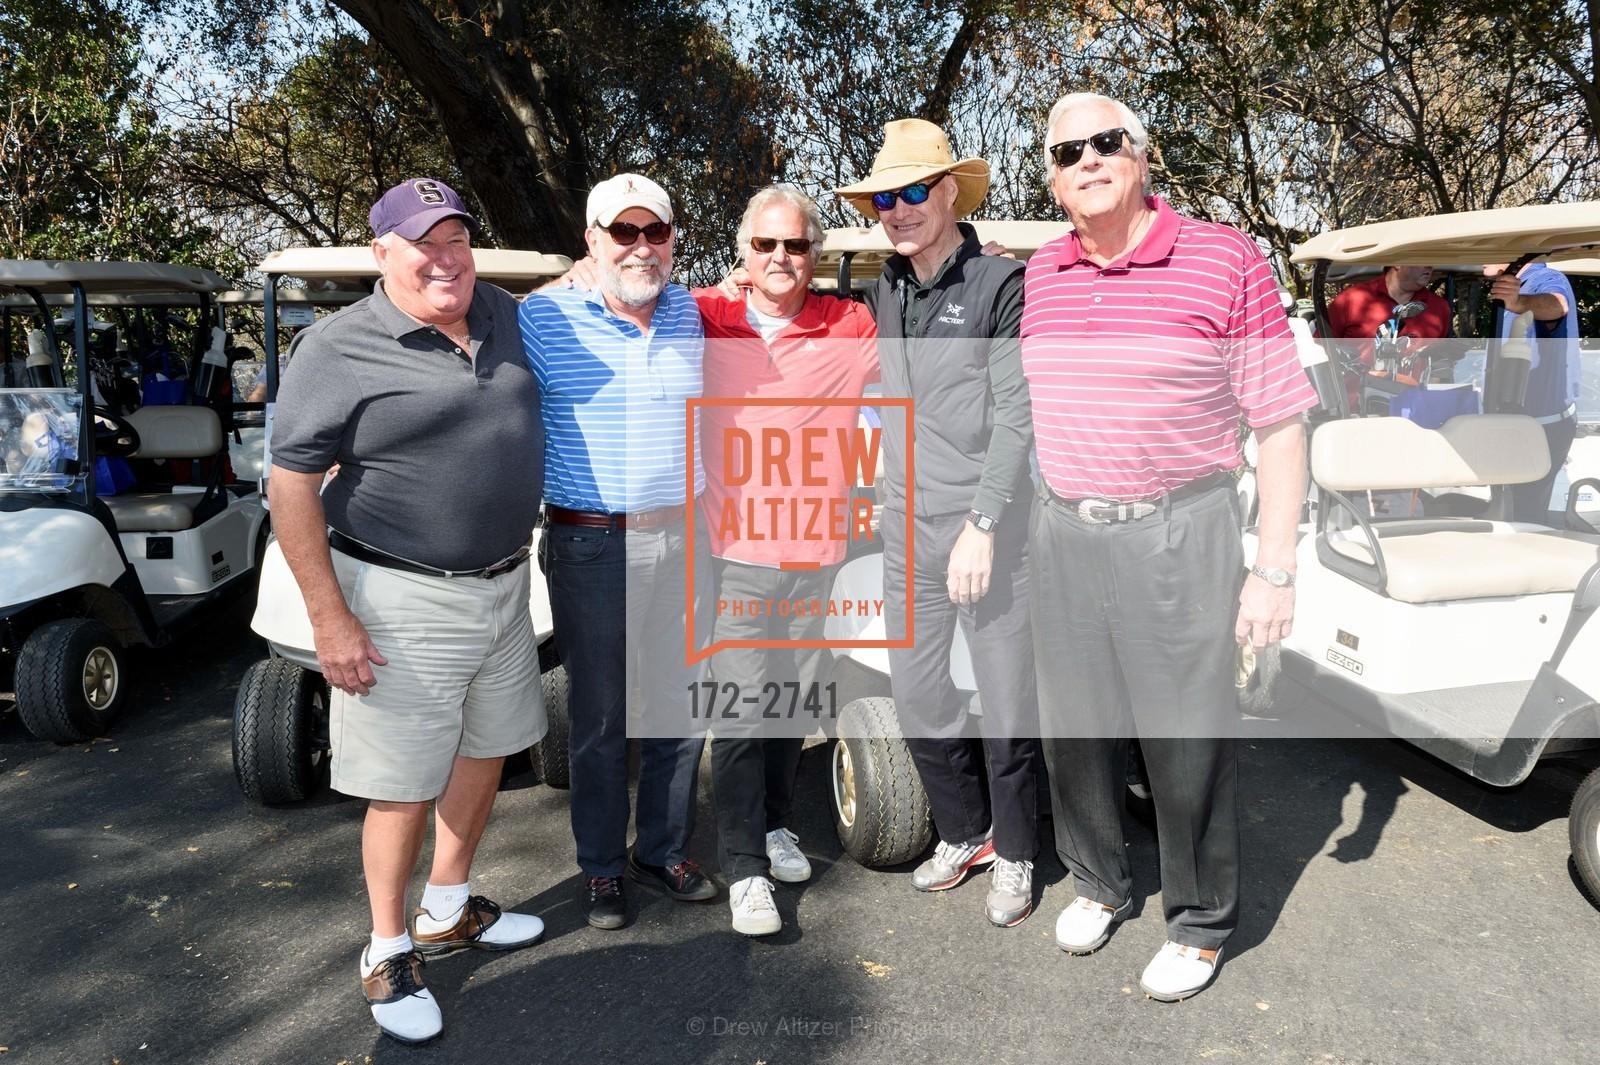 Dennis Bragonier, Dennis Sheehan, Eric Cross, Dennis Peterson, Kramer, Brad Williams, Photo #172-2741